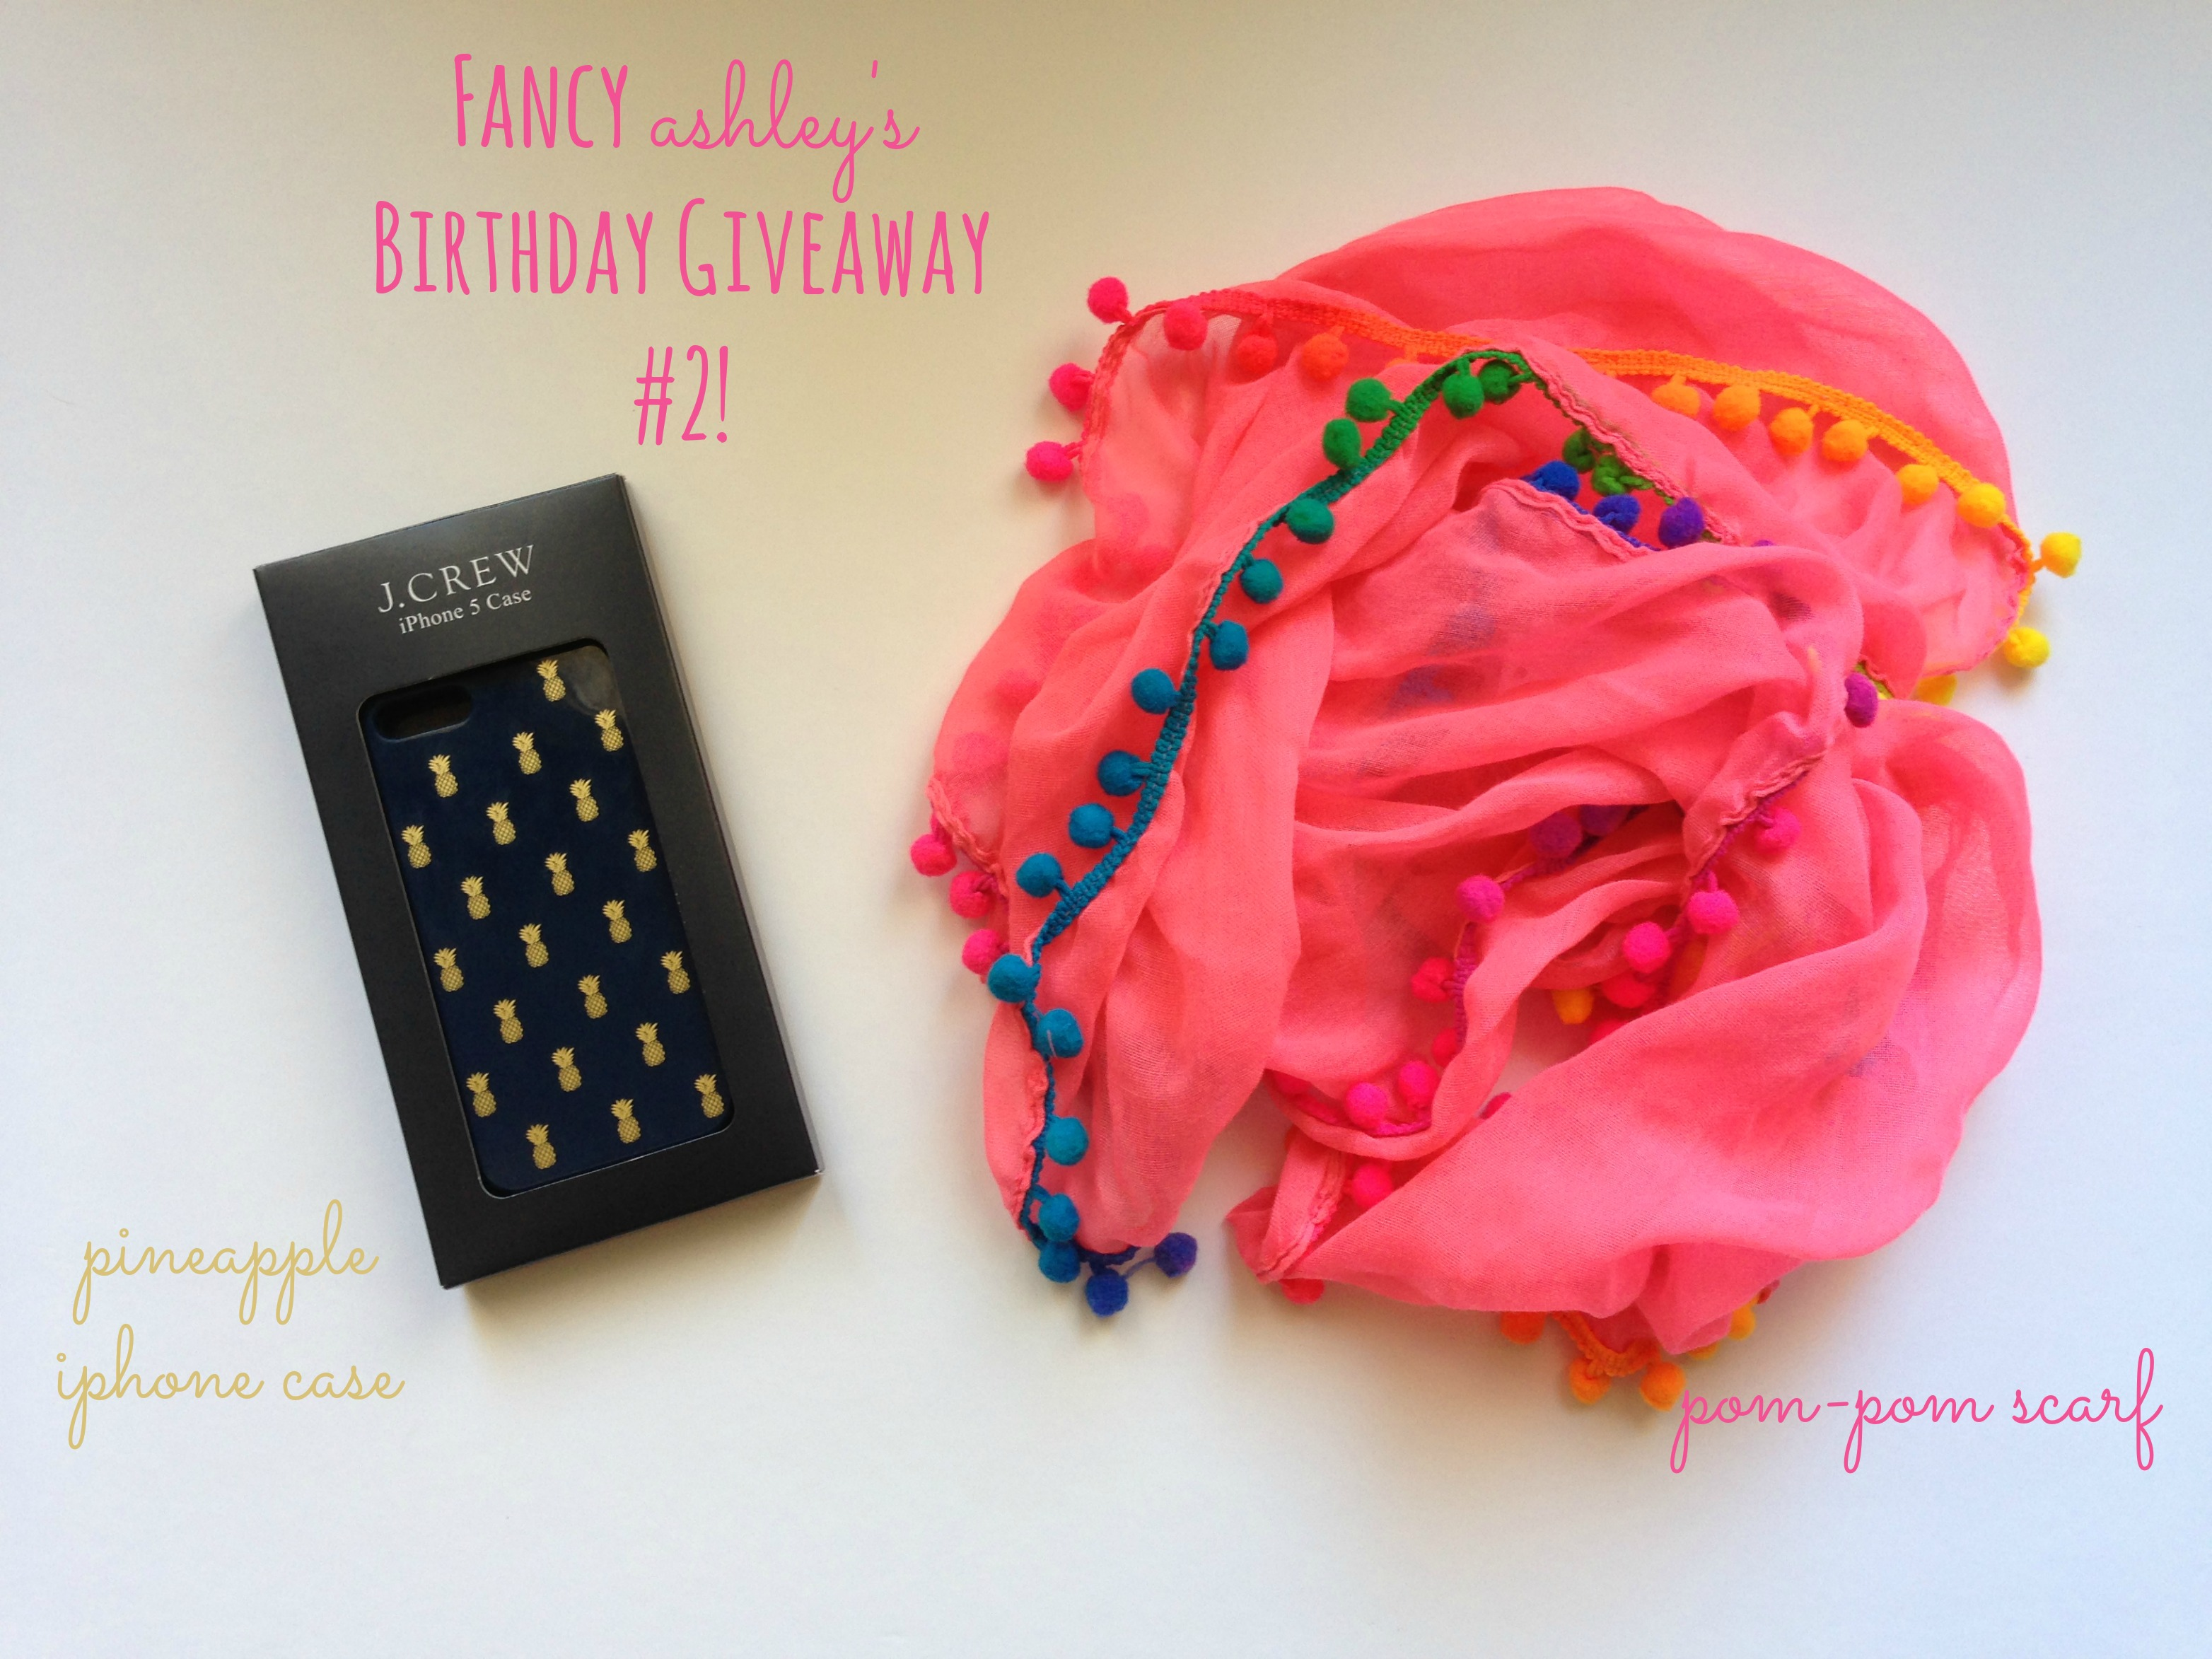 birthday giveaway 2